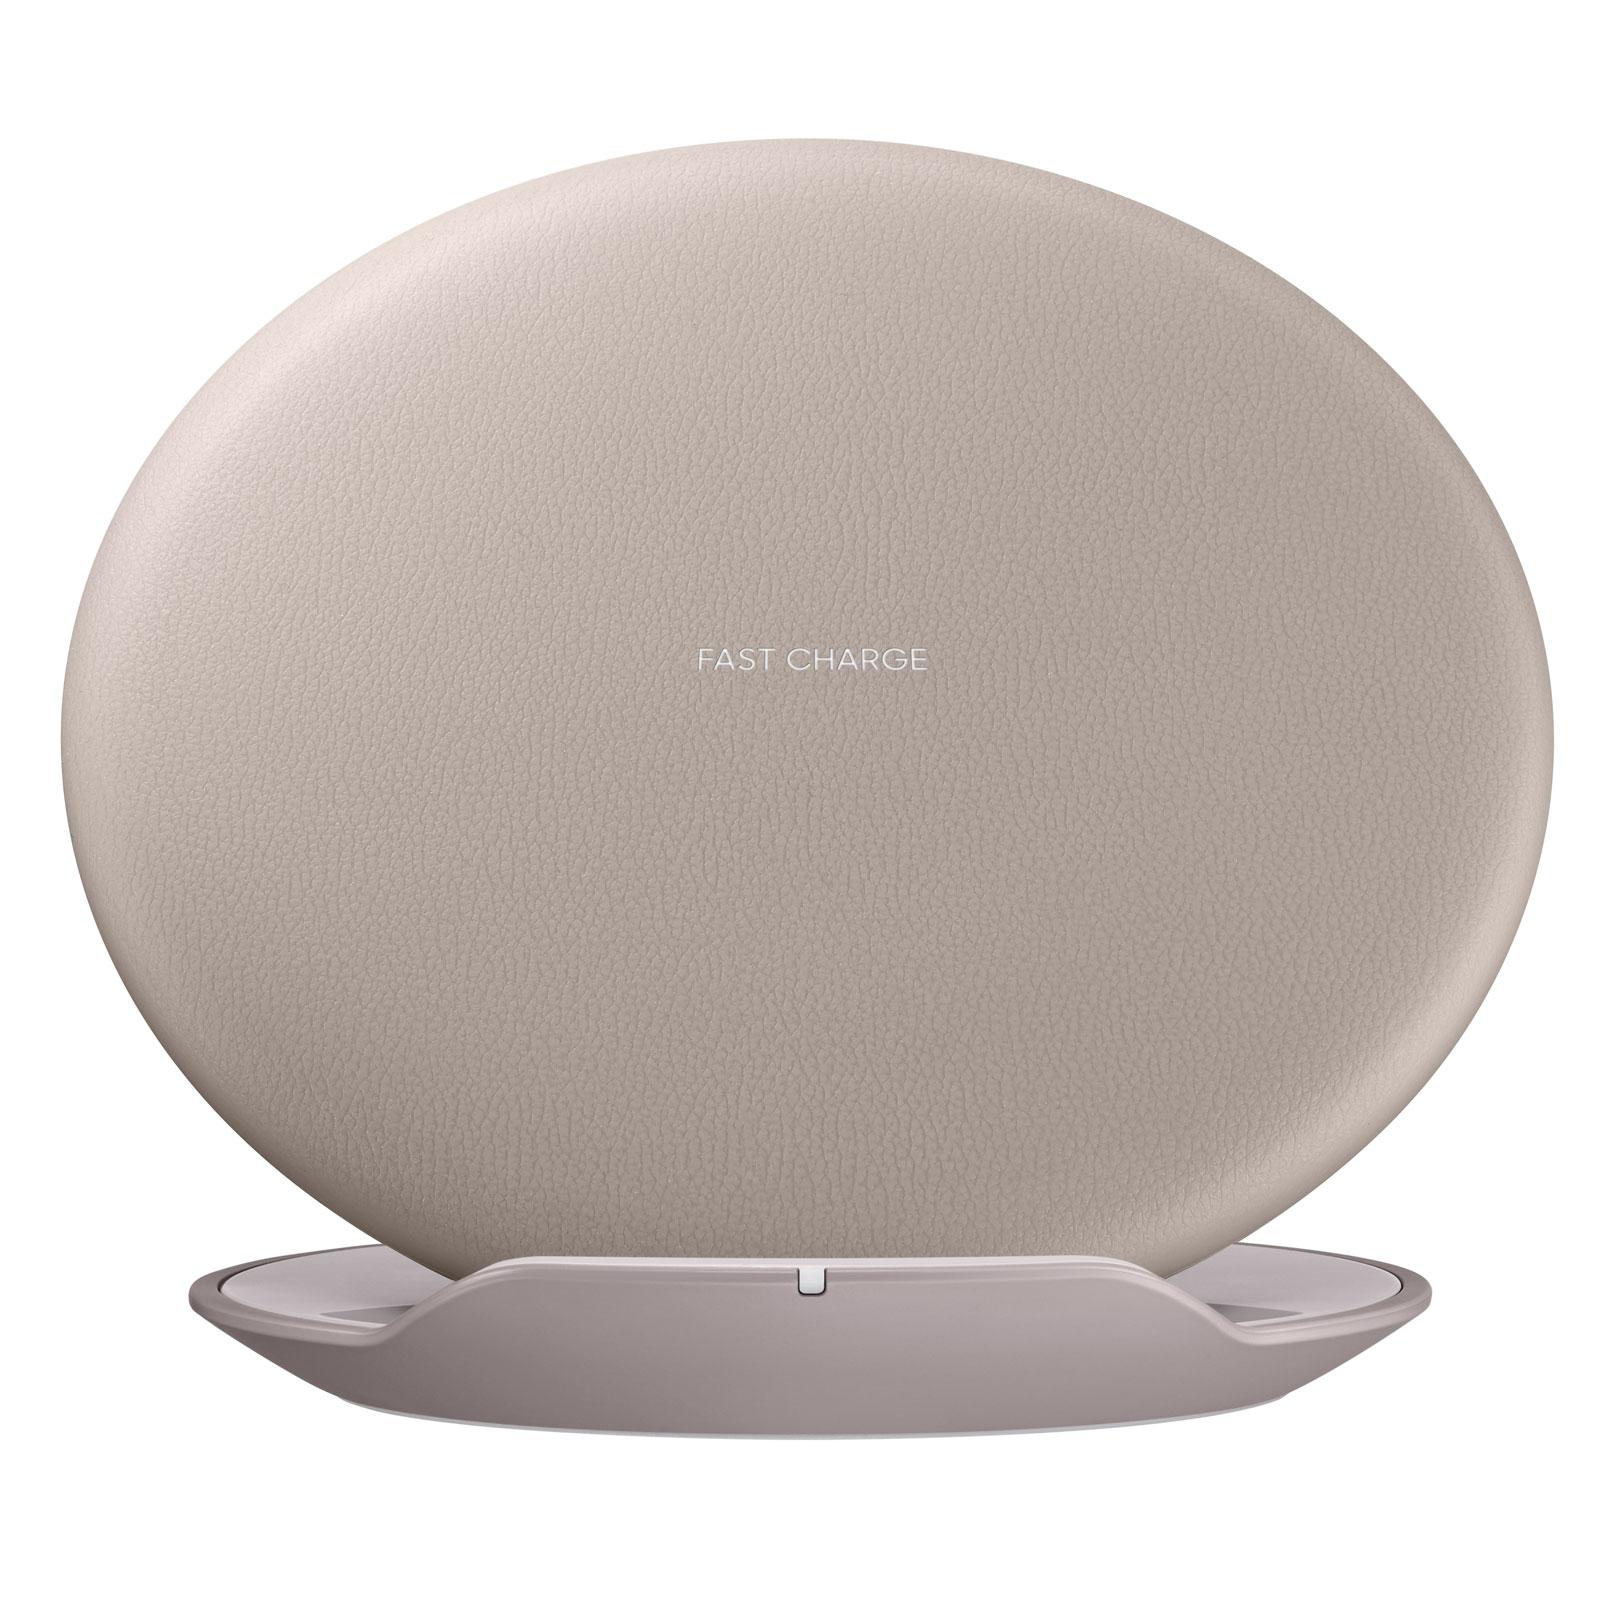 samsung pad induction 2 positions marron chargeur t l phone samsung sur. Black Bedroom Furniture Sets. Home Design Ideas